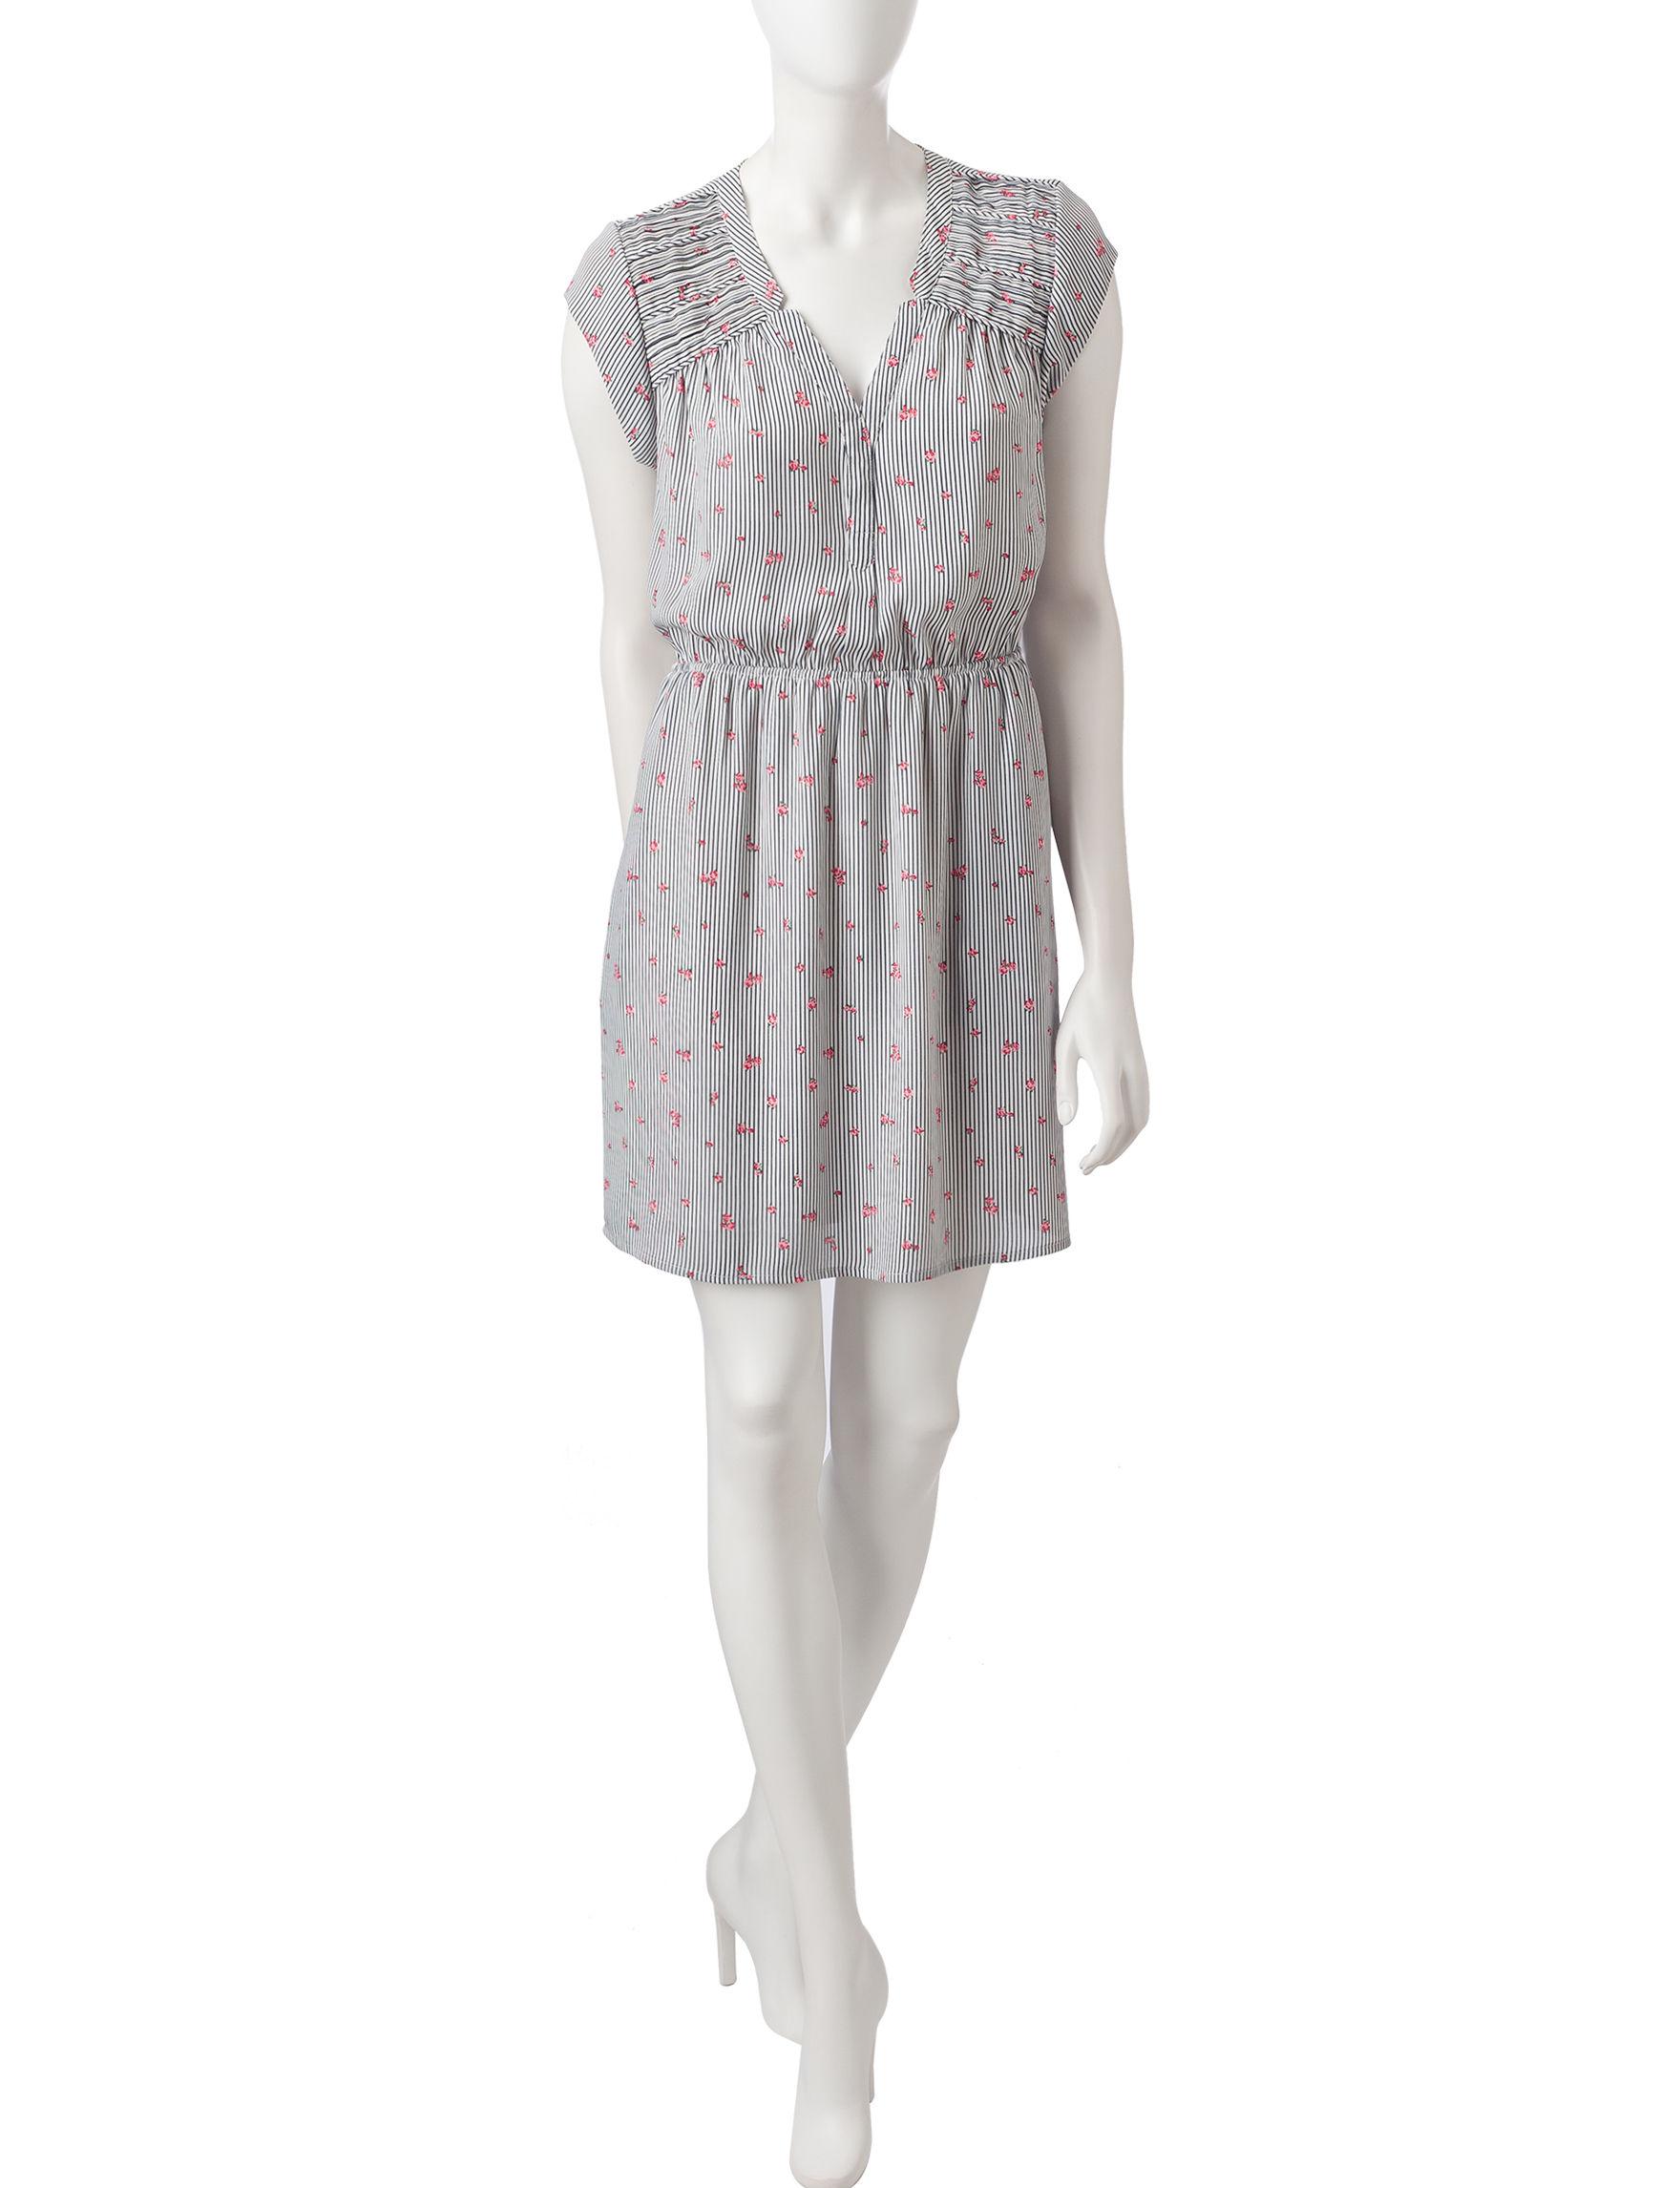 Signature Studio Stripe / Floral Everyday & Casual Shirt Dresses